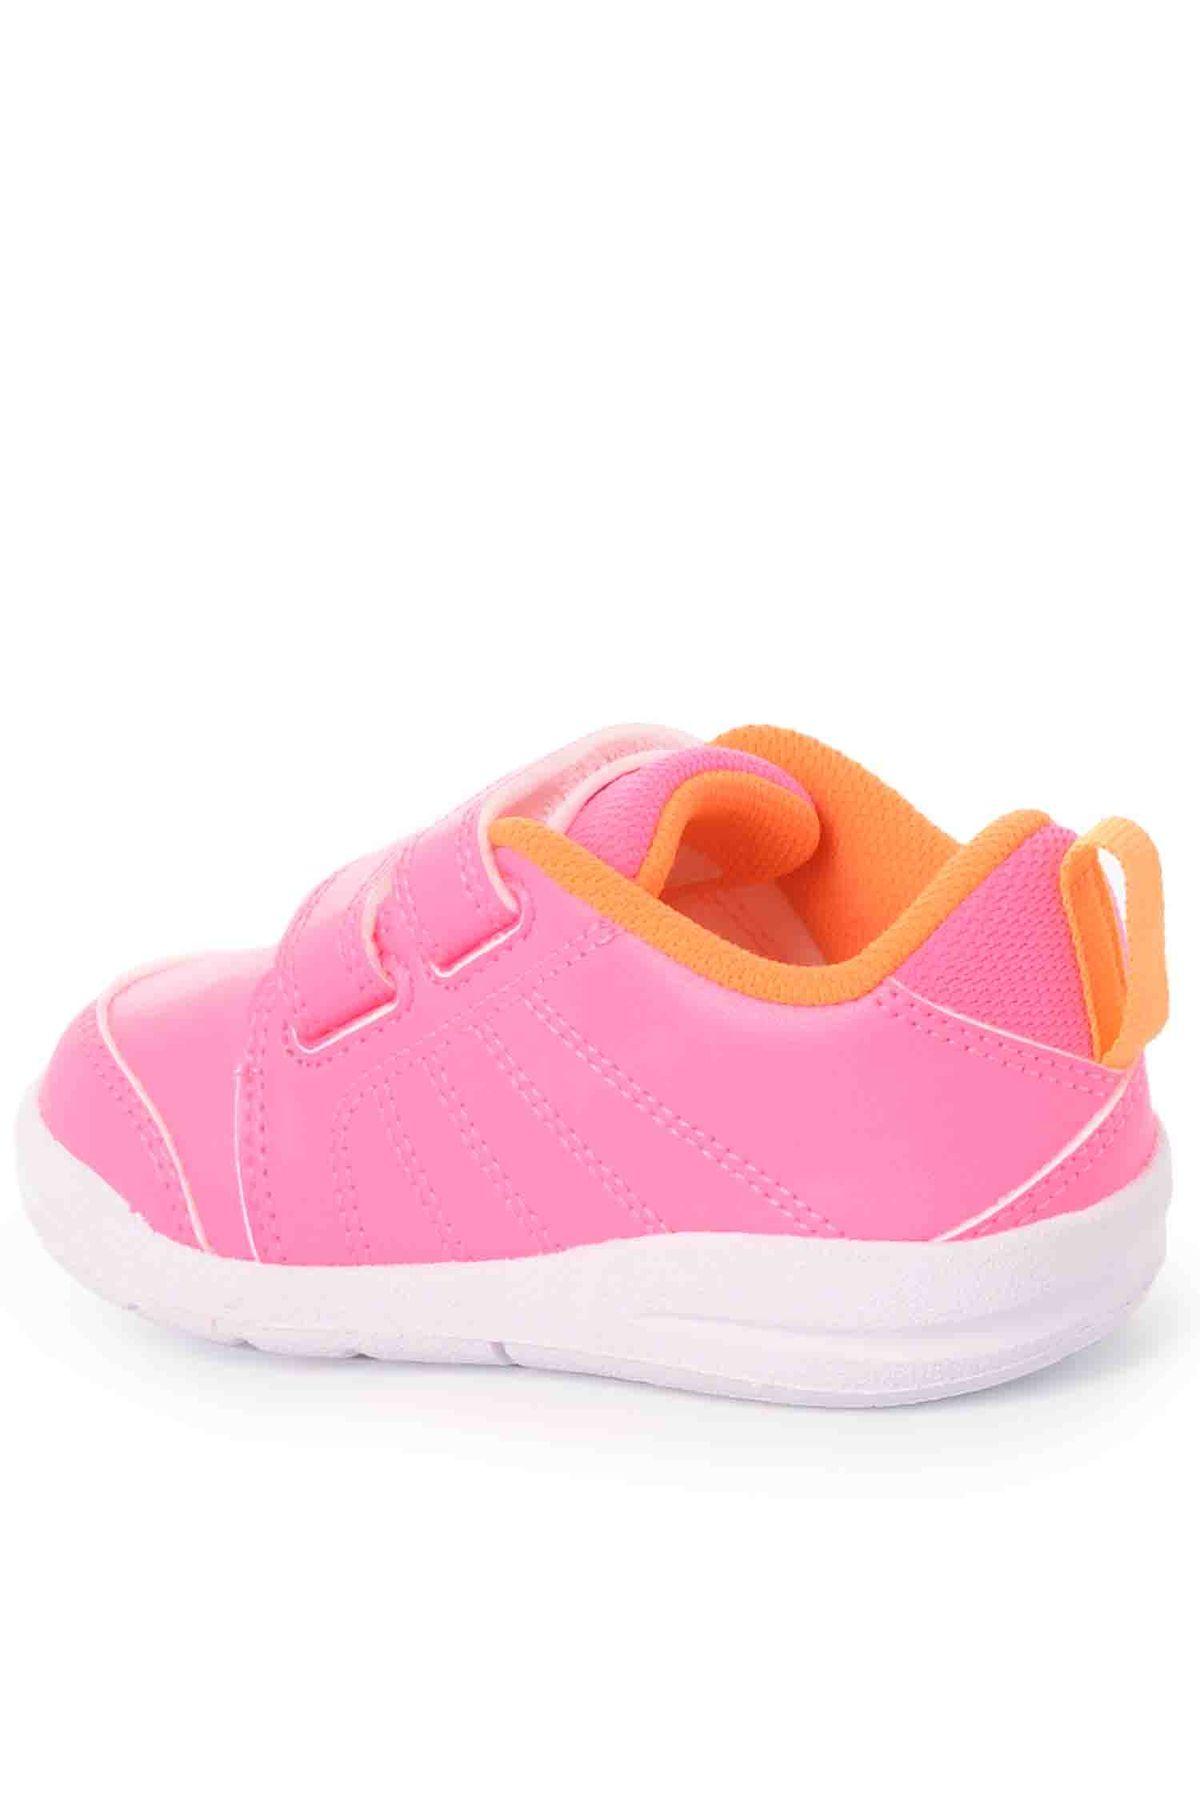 db02d1c1537 Tênis Infantil Nike Pico